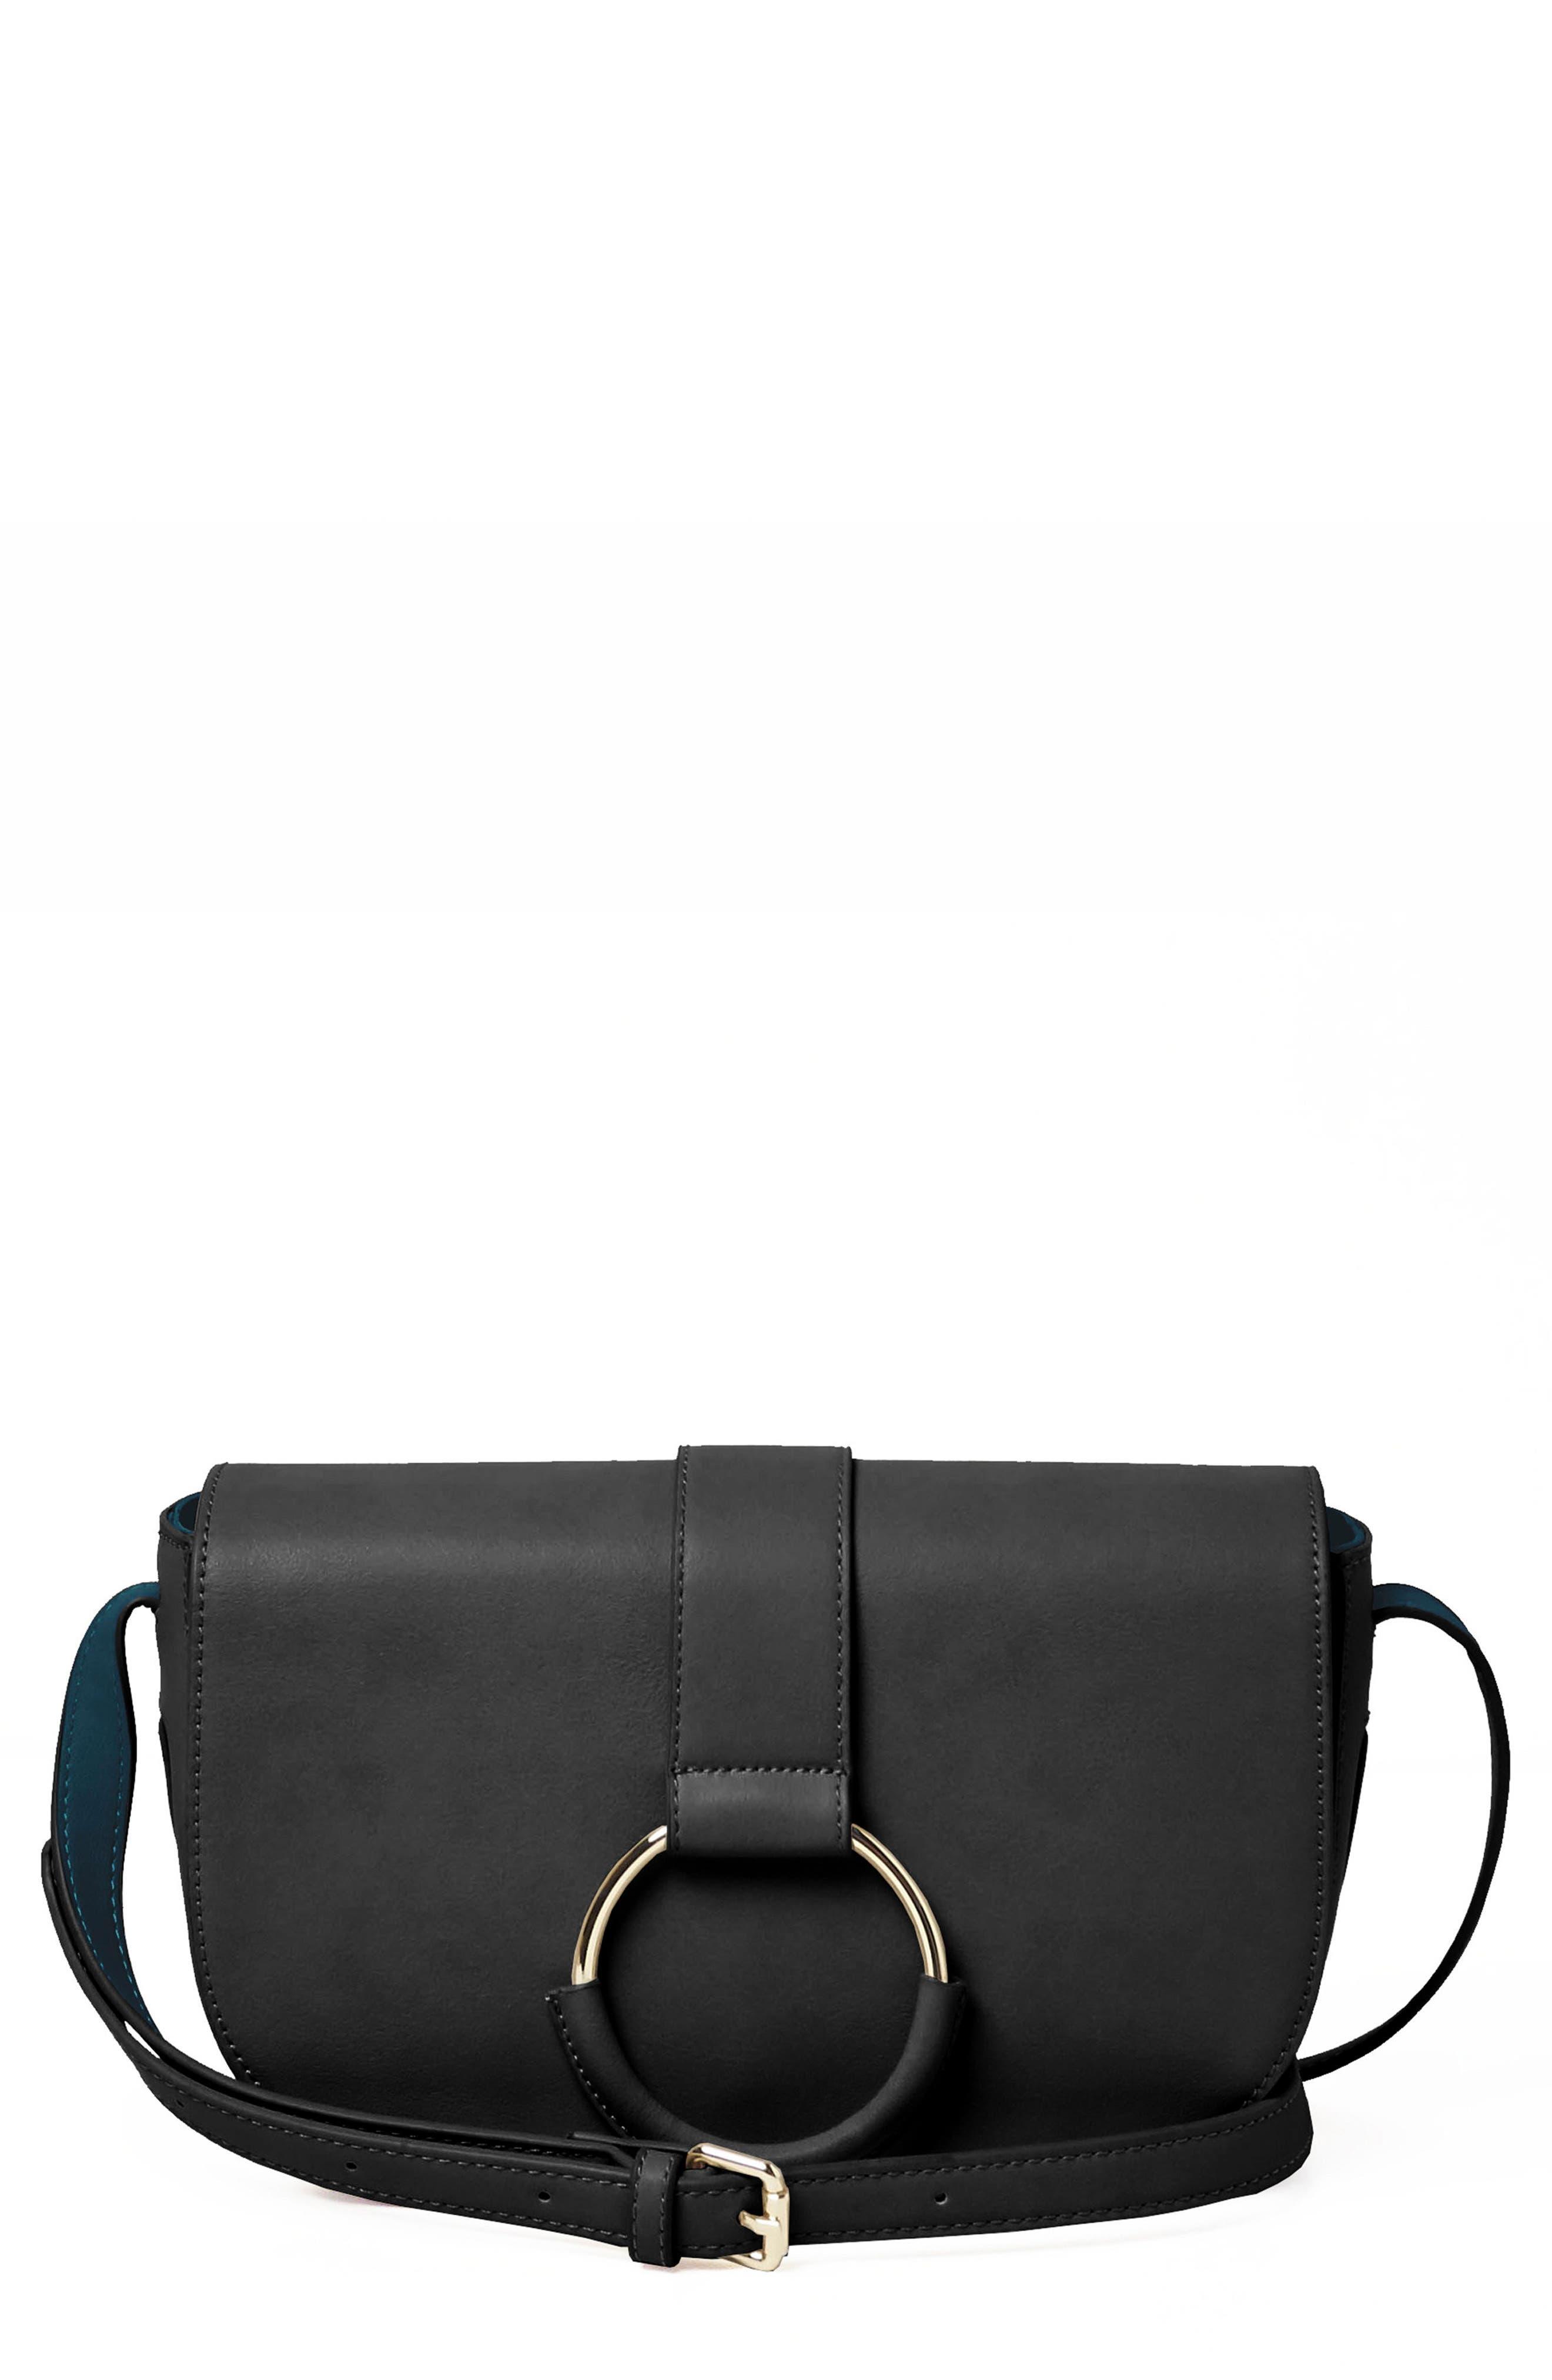 URBAN ORIGINALS,                             Lolita Vegan Leather Crossbody Bag,                             Main thumbnail 1, color,                             001